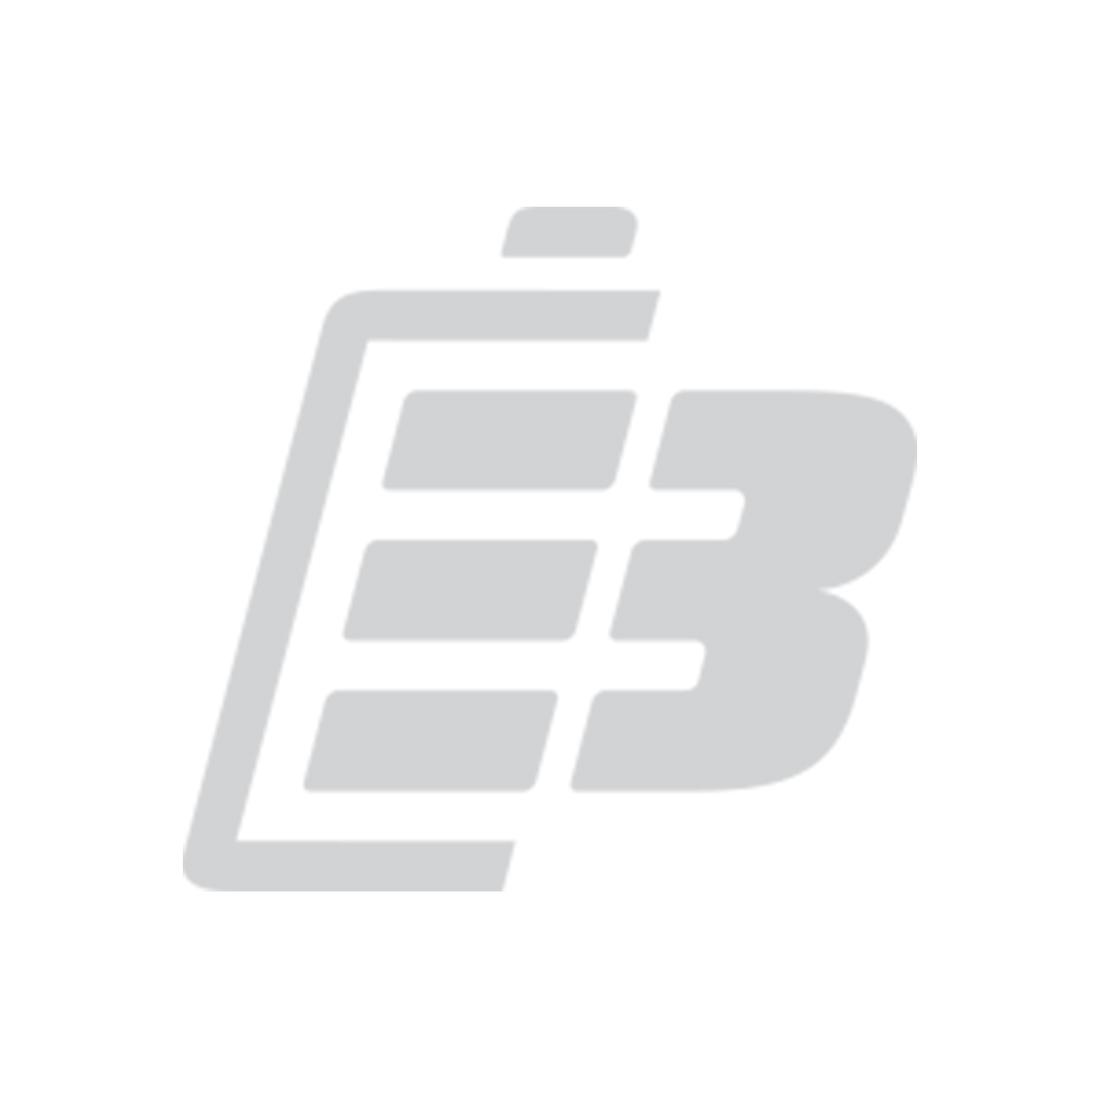 Two-Way radio battery Icom BP-196 1850mah_1